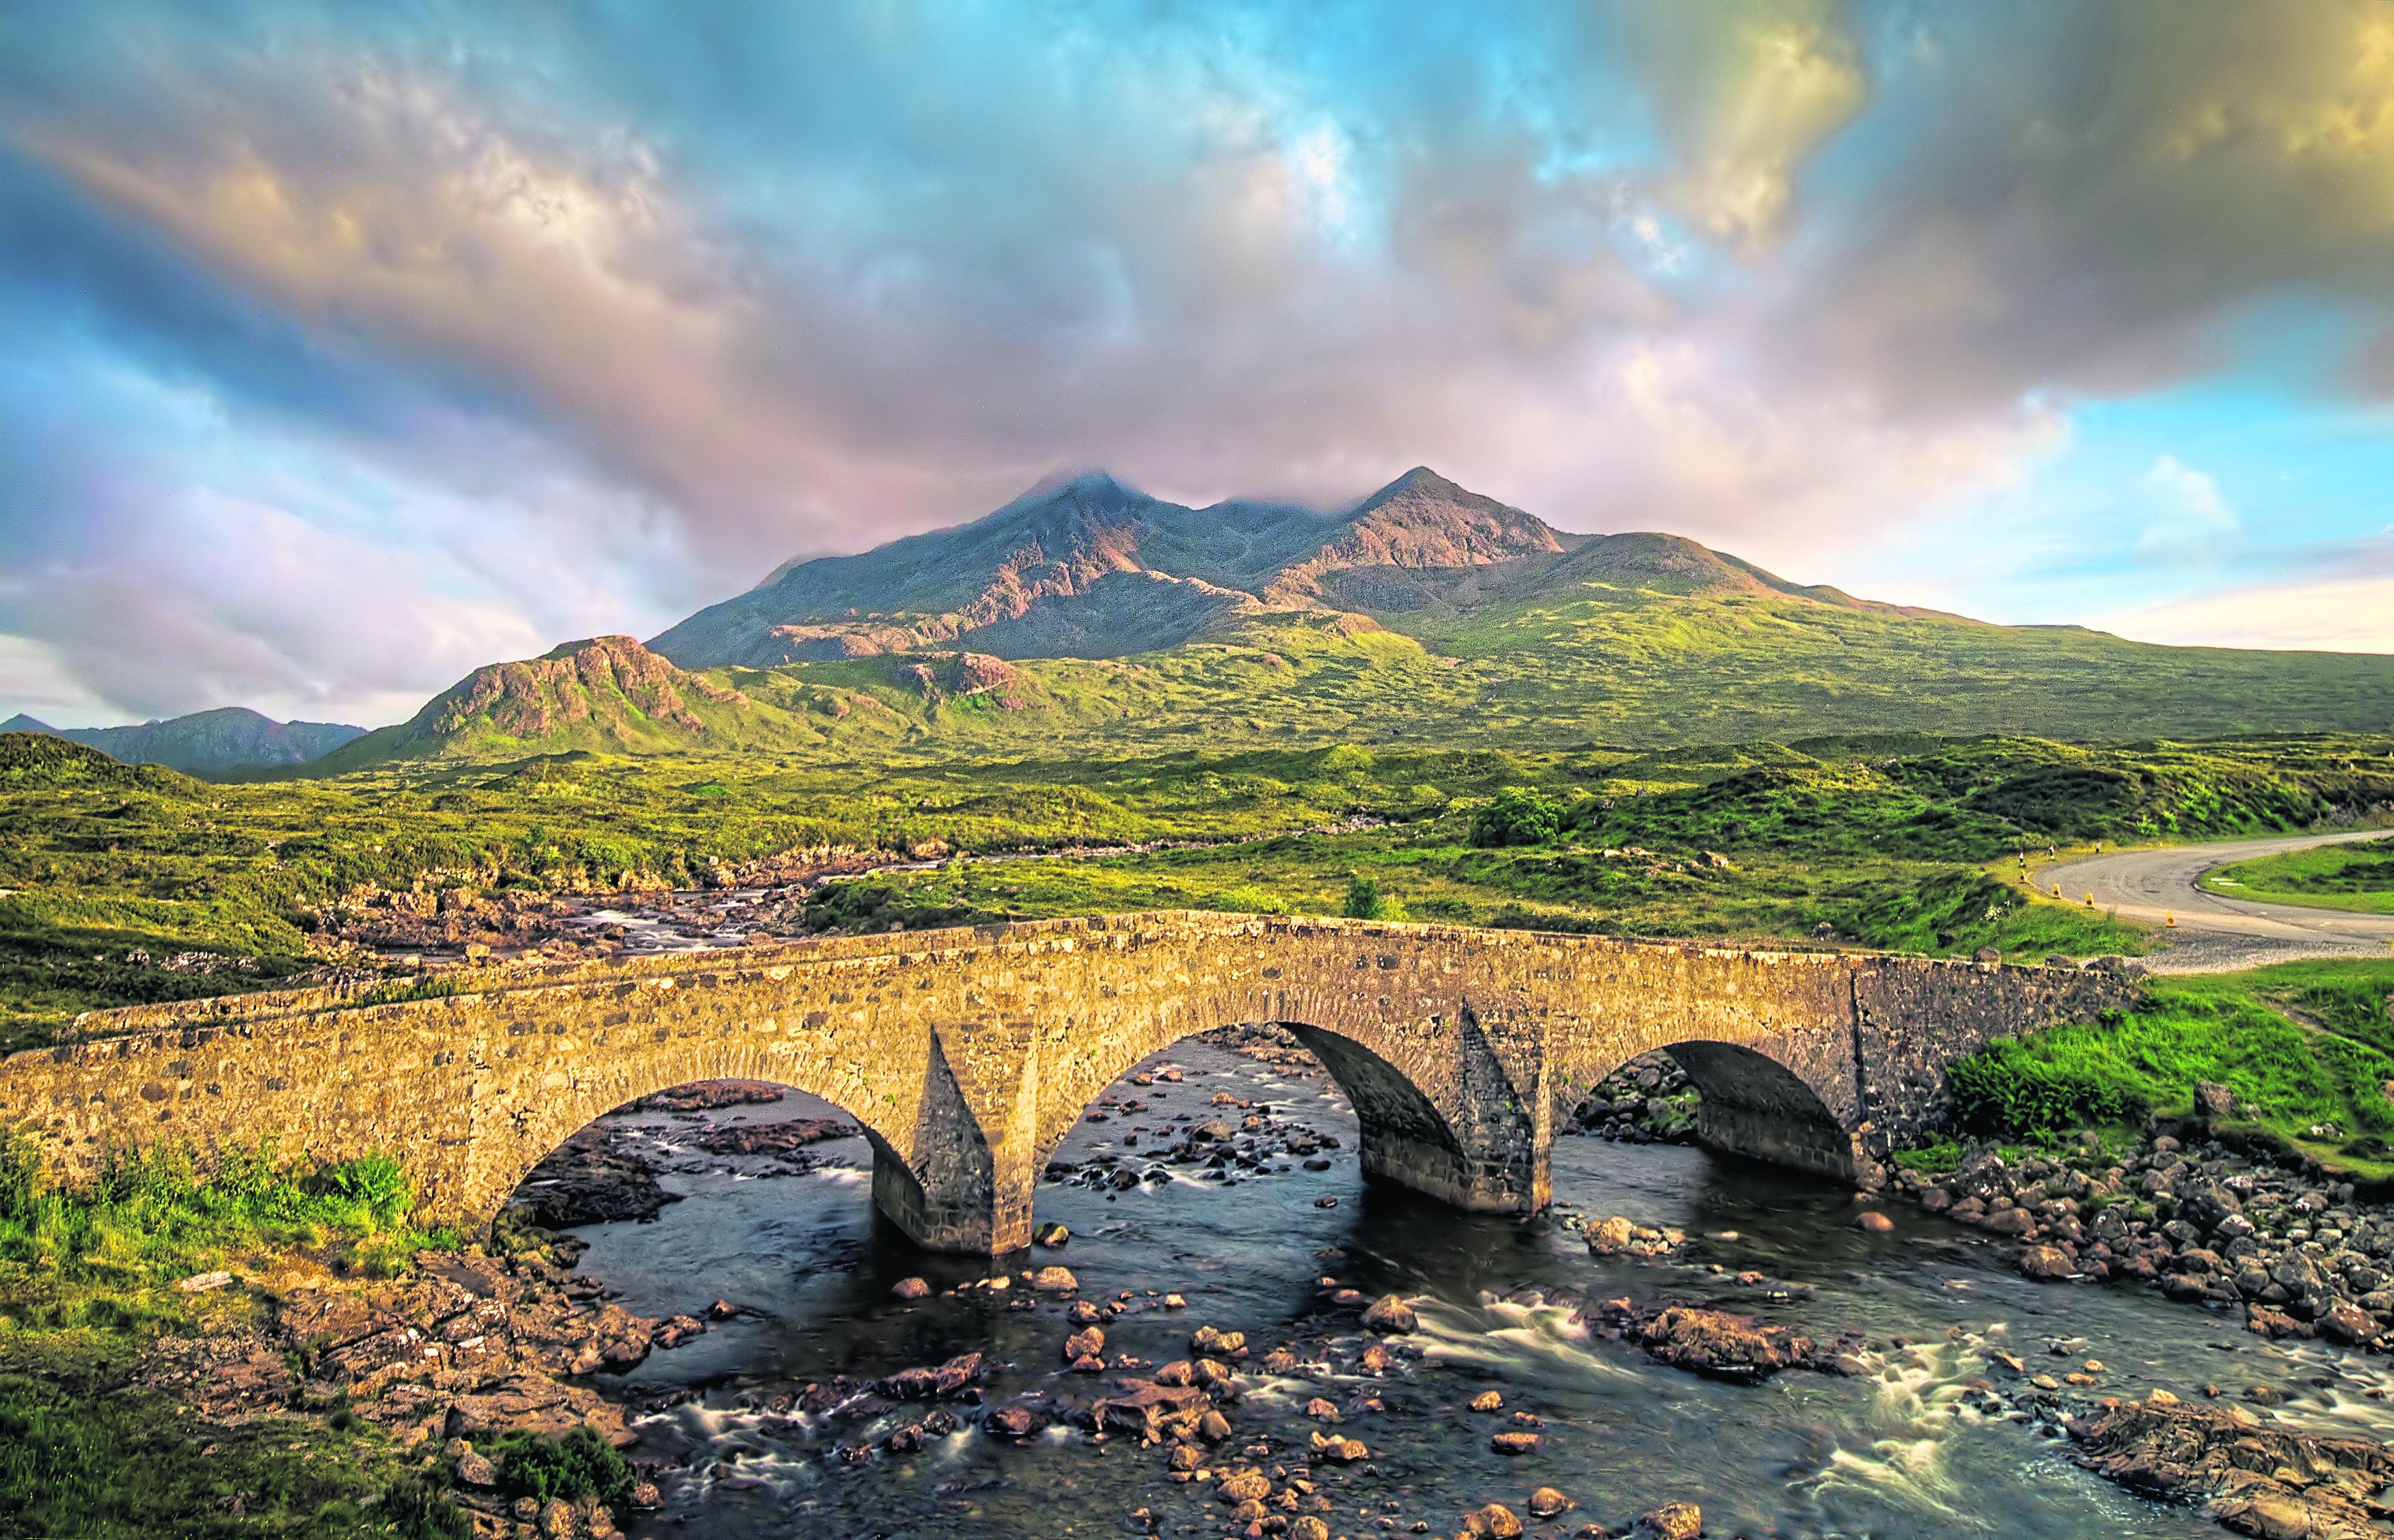 Sligachan Bridge and cloudy Black Cuillins in sunset light, Isle of Skye.